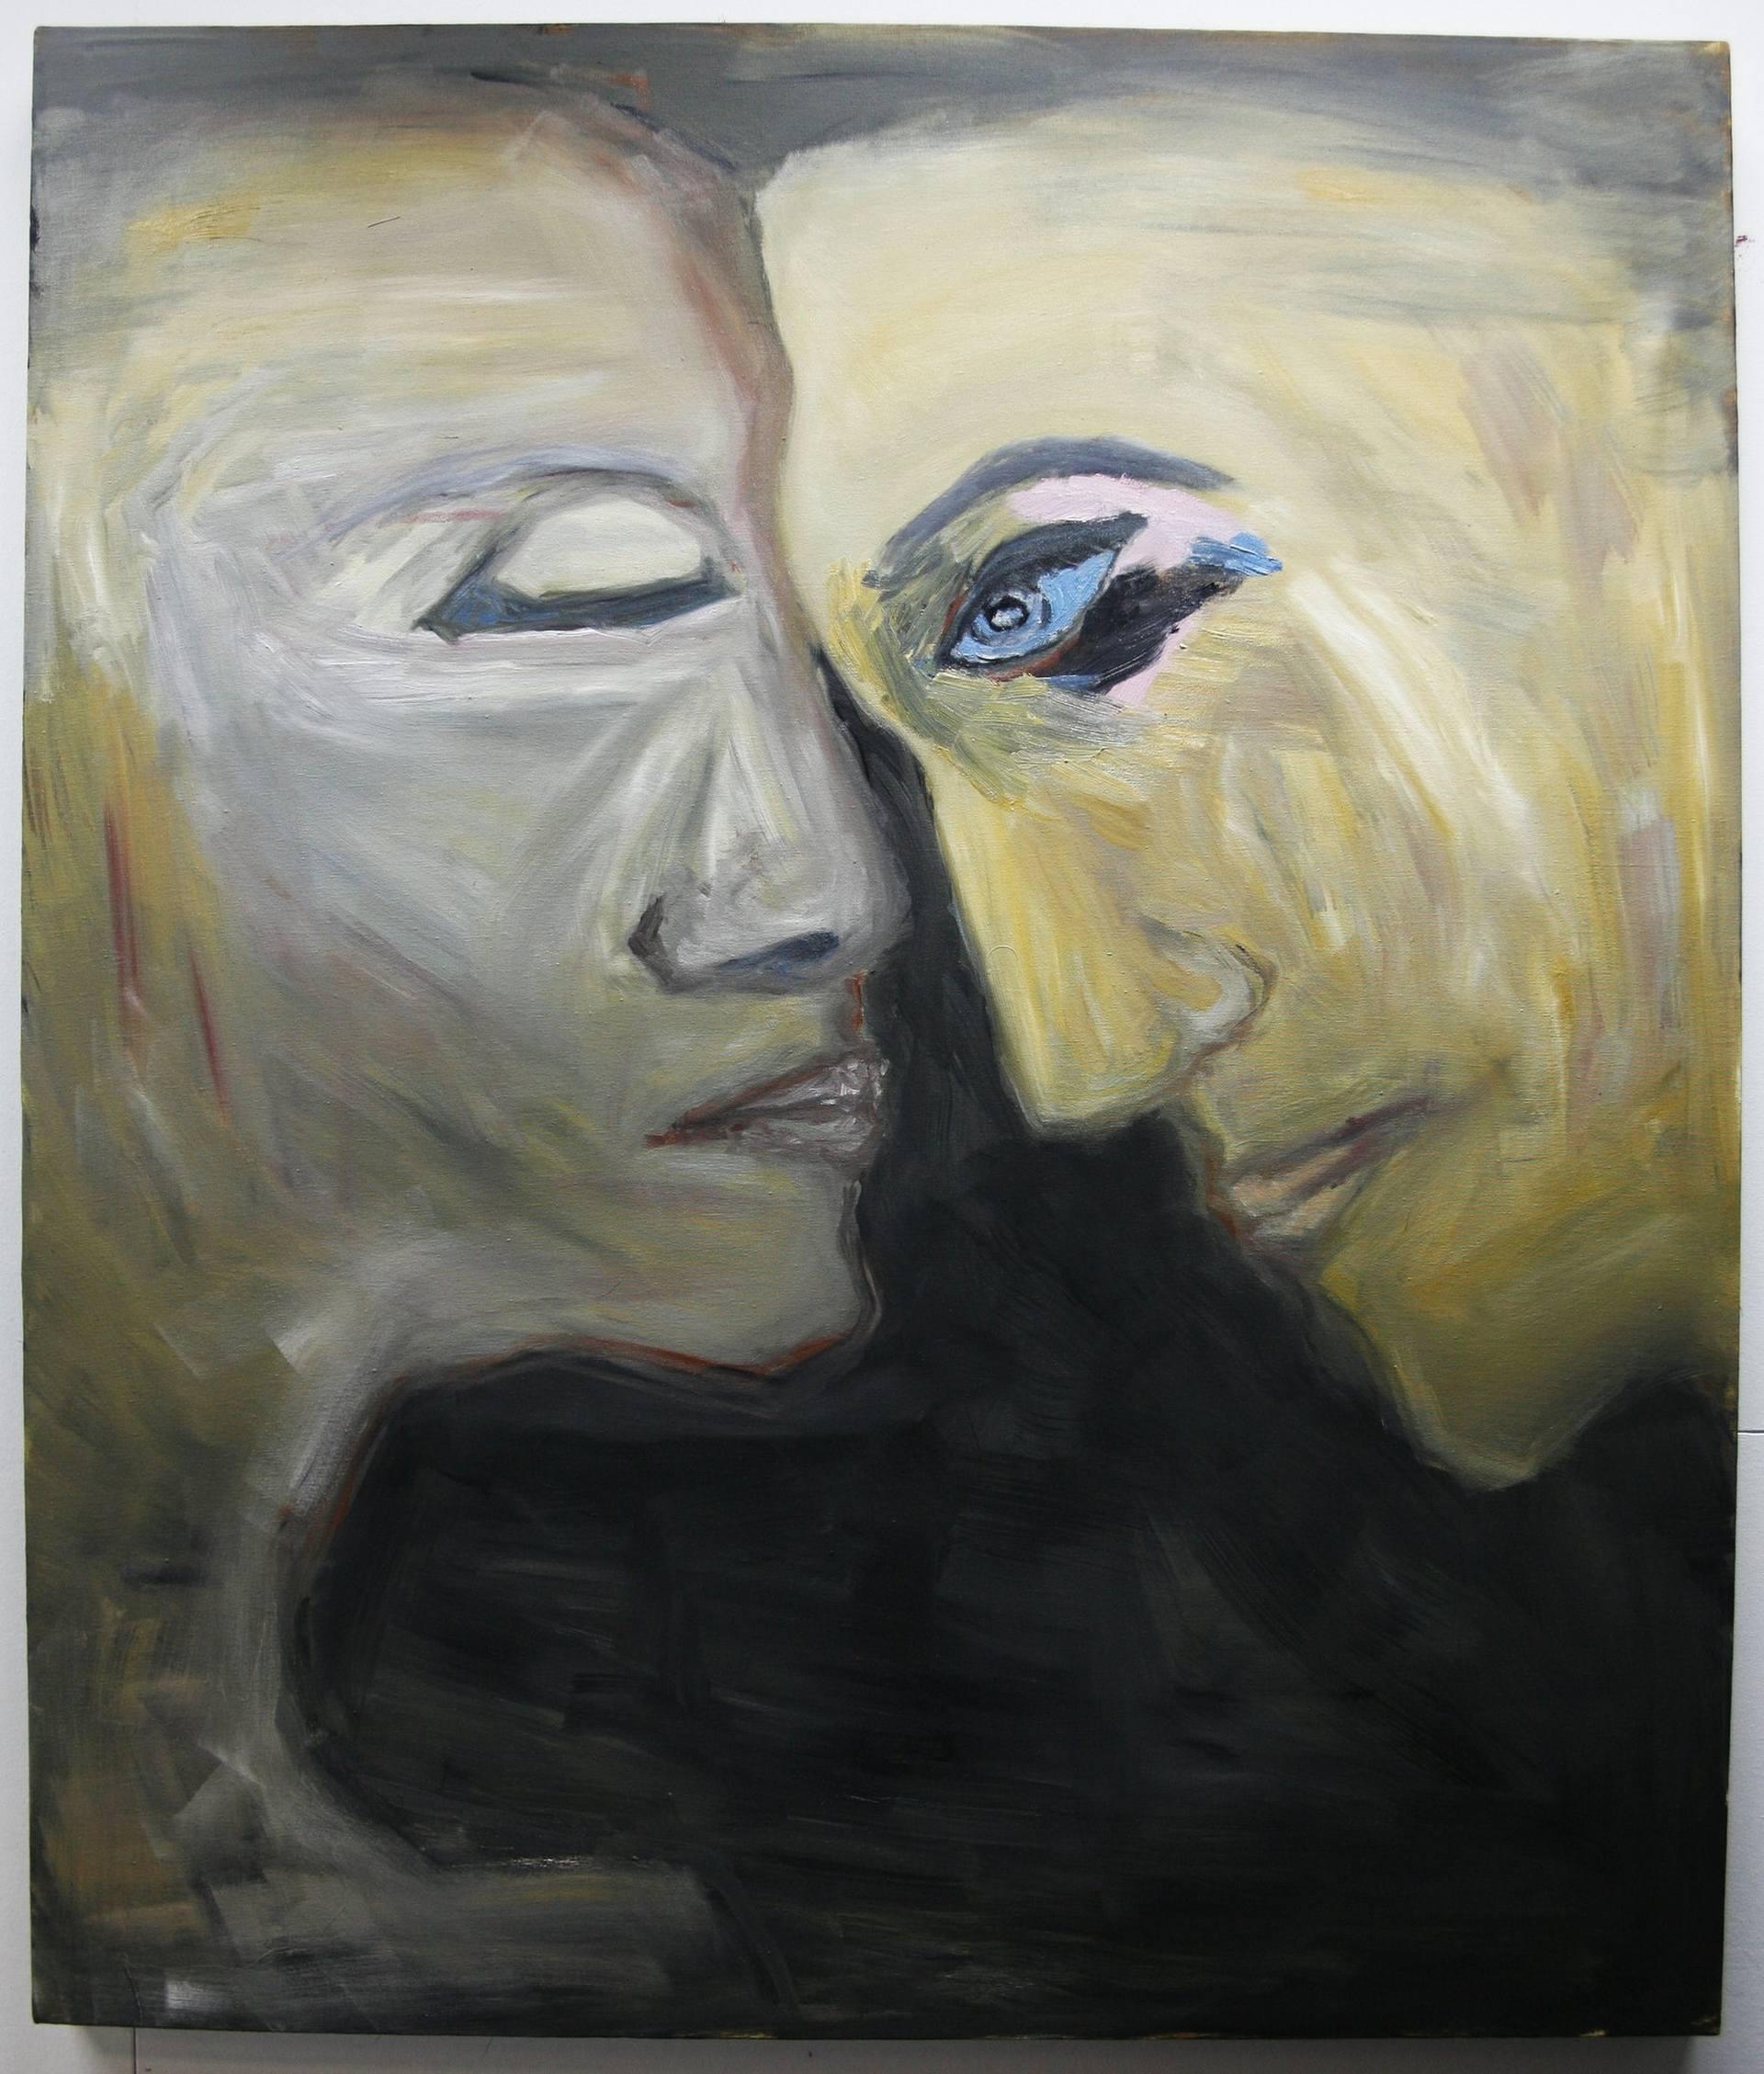 Risultati immagini per pain together saatchi art